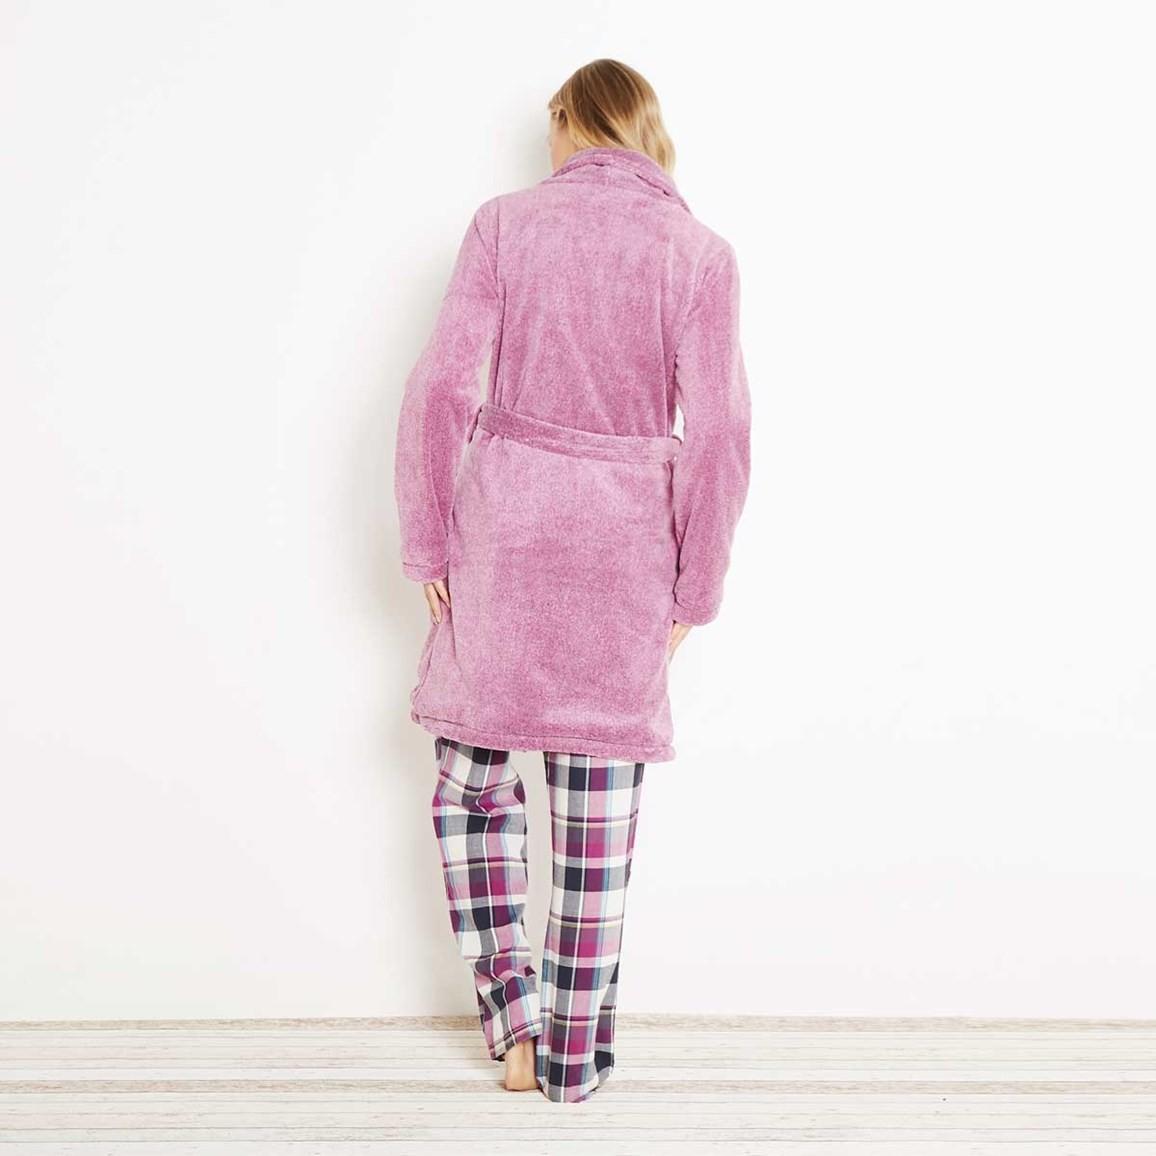 cc2cfb9d7e Fernanda Plush Fur Fleece Dressing Gown Sloeberry